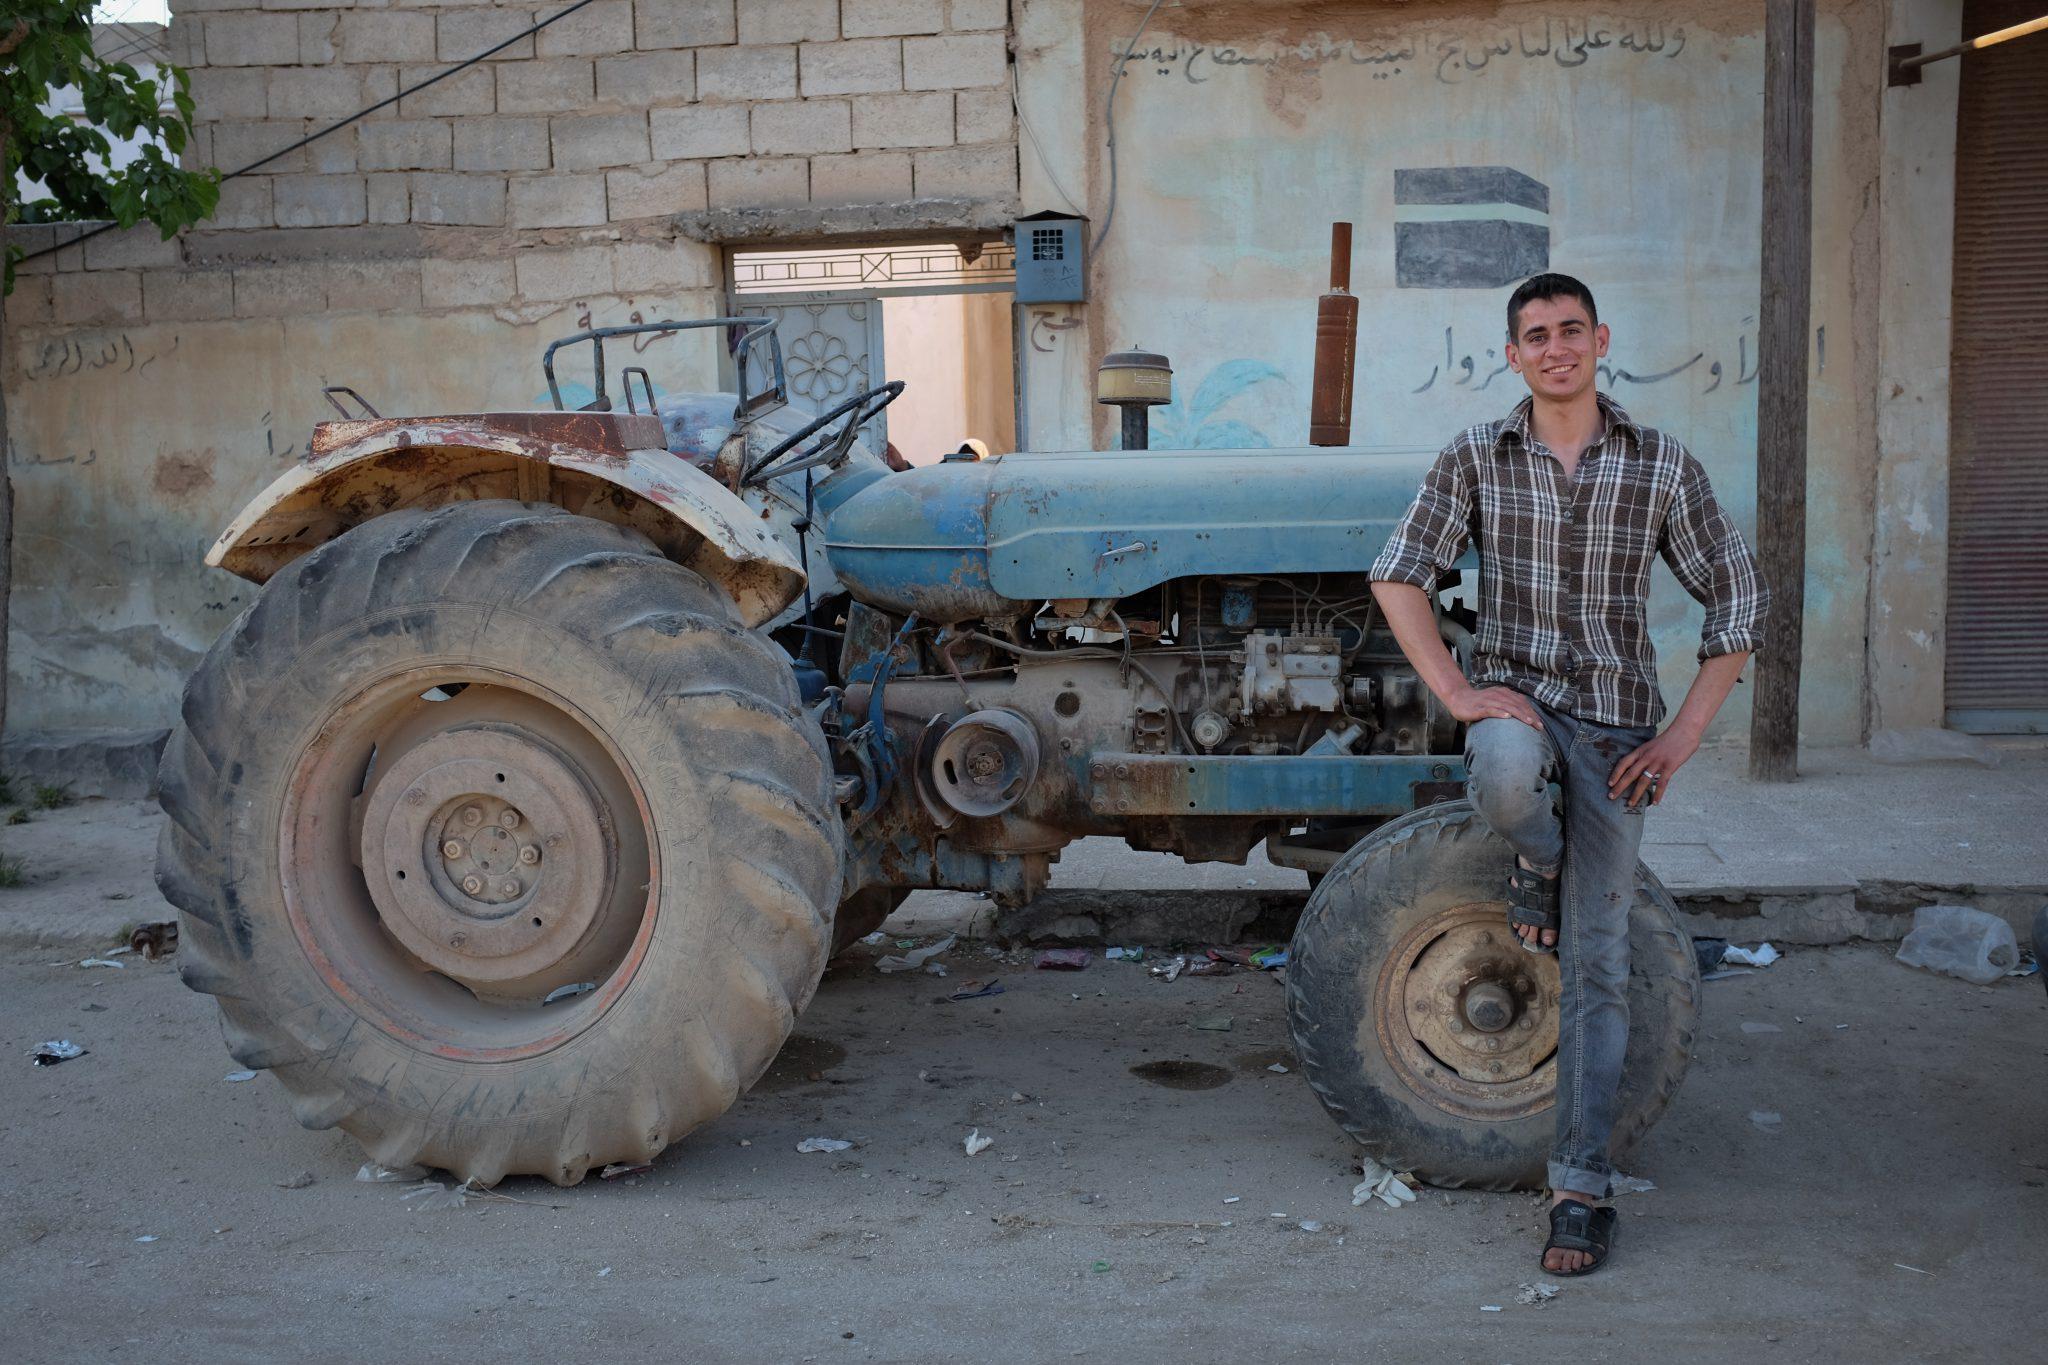 Cynddylan on a Tractor - Sample Essay